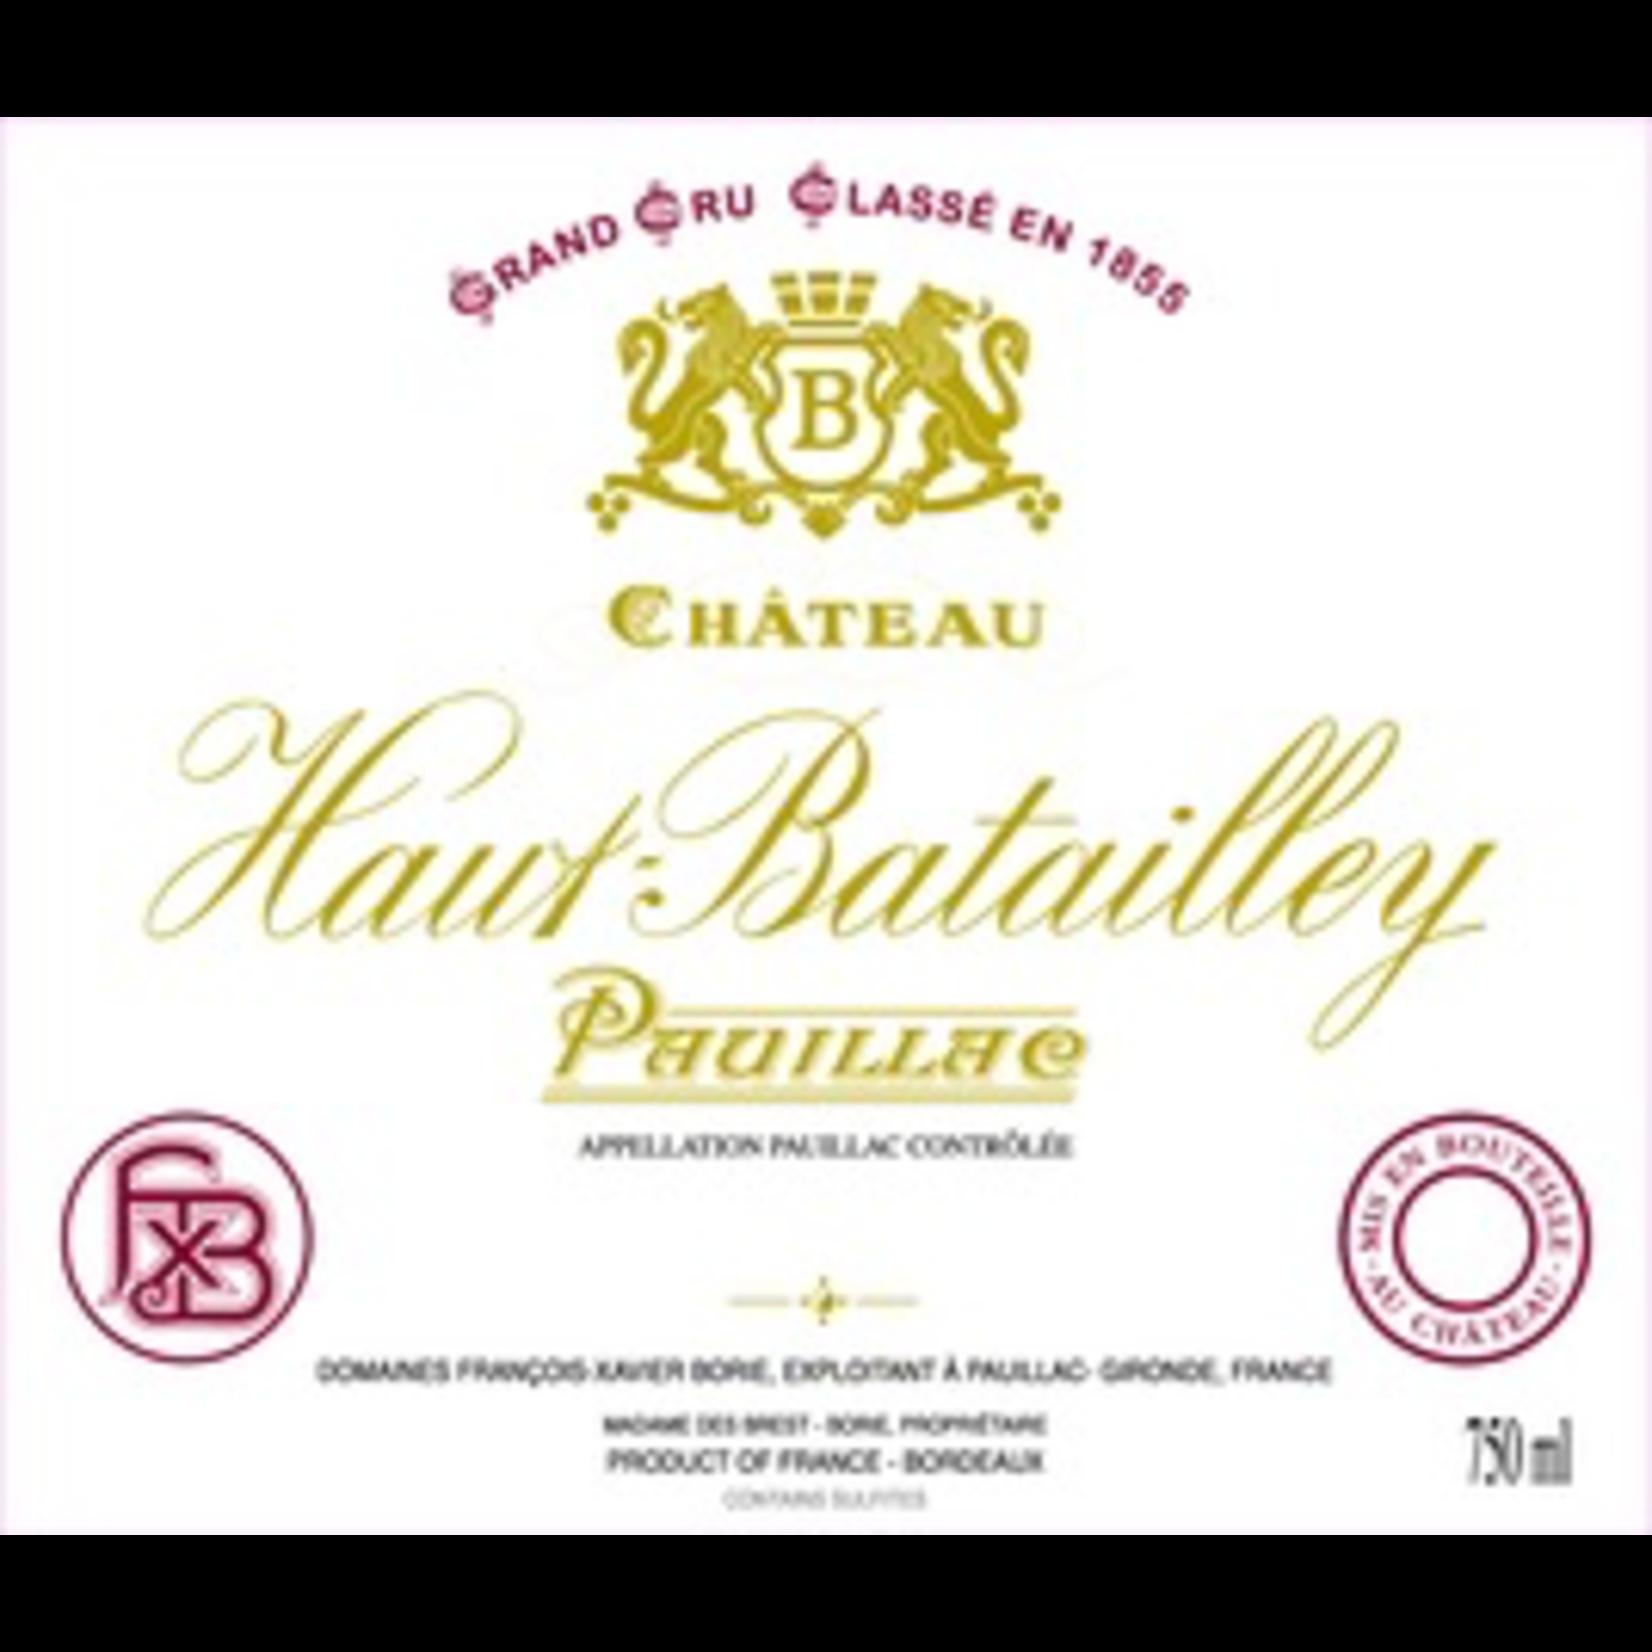 Chateau Haut Batailley 2018